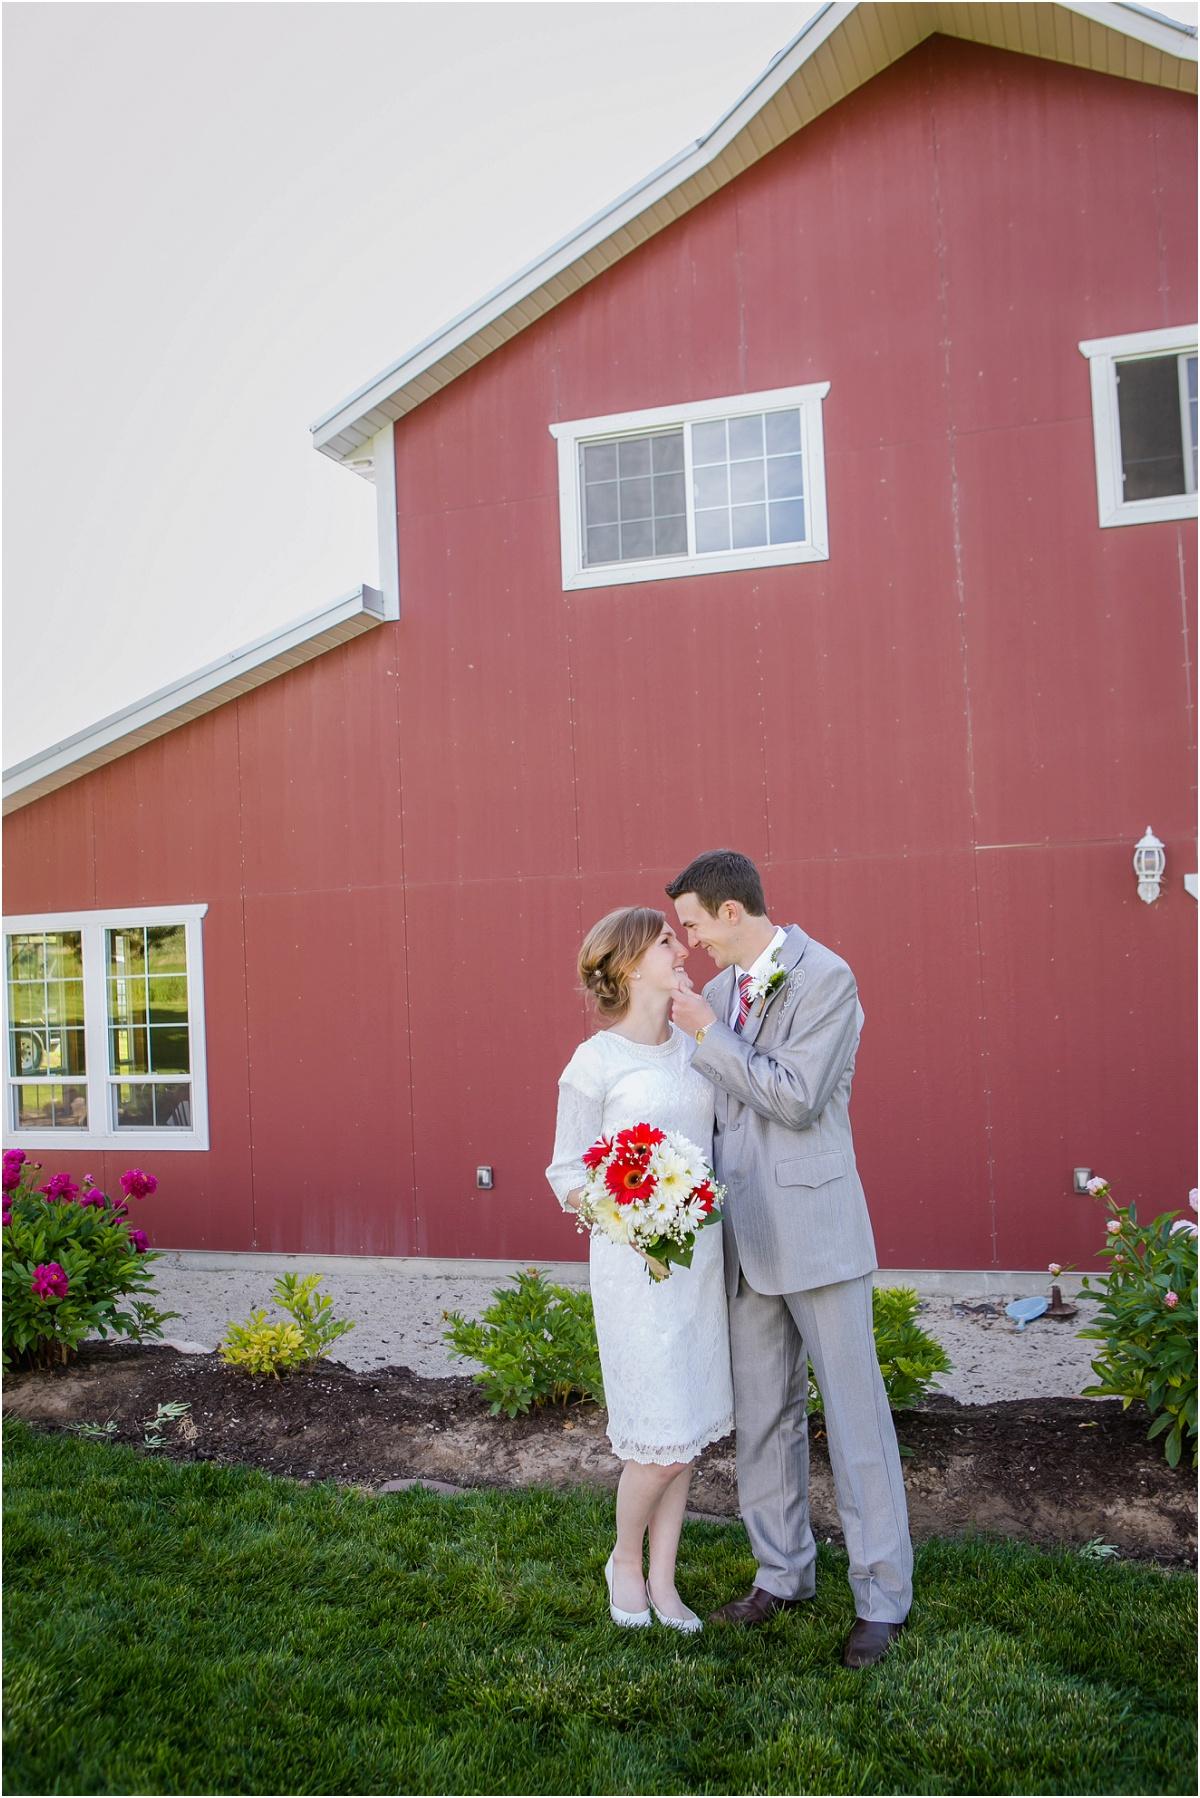 Manti Temple Rustic Wedding Terra Cooper Photography_3090.jpg